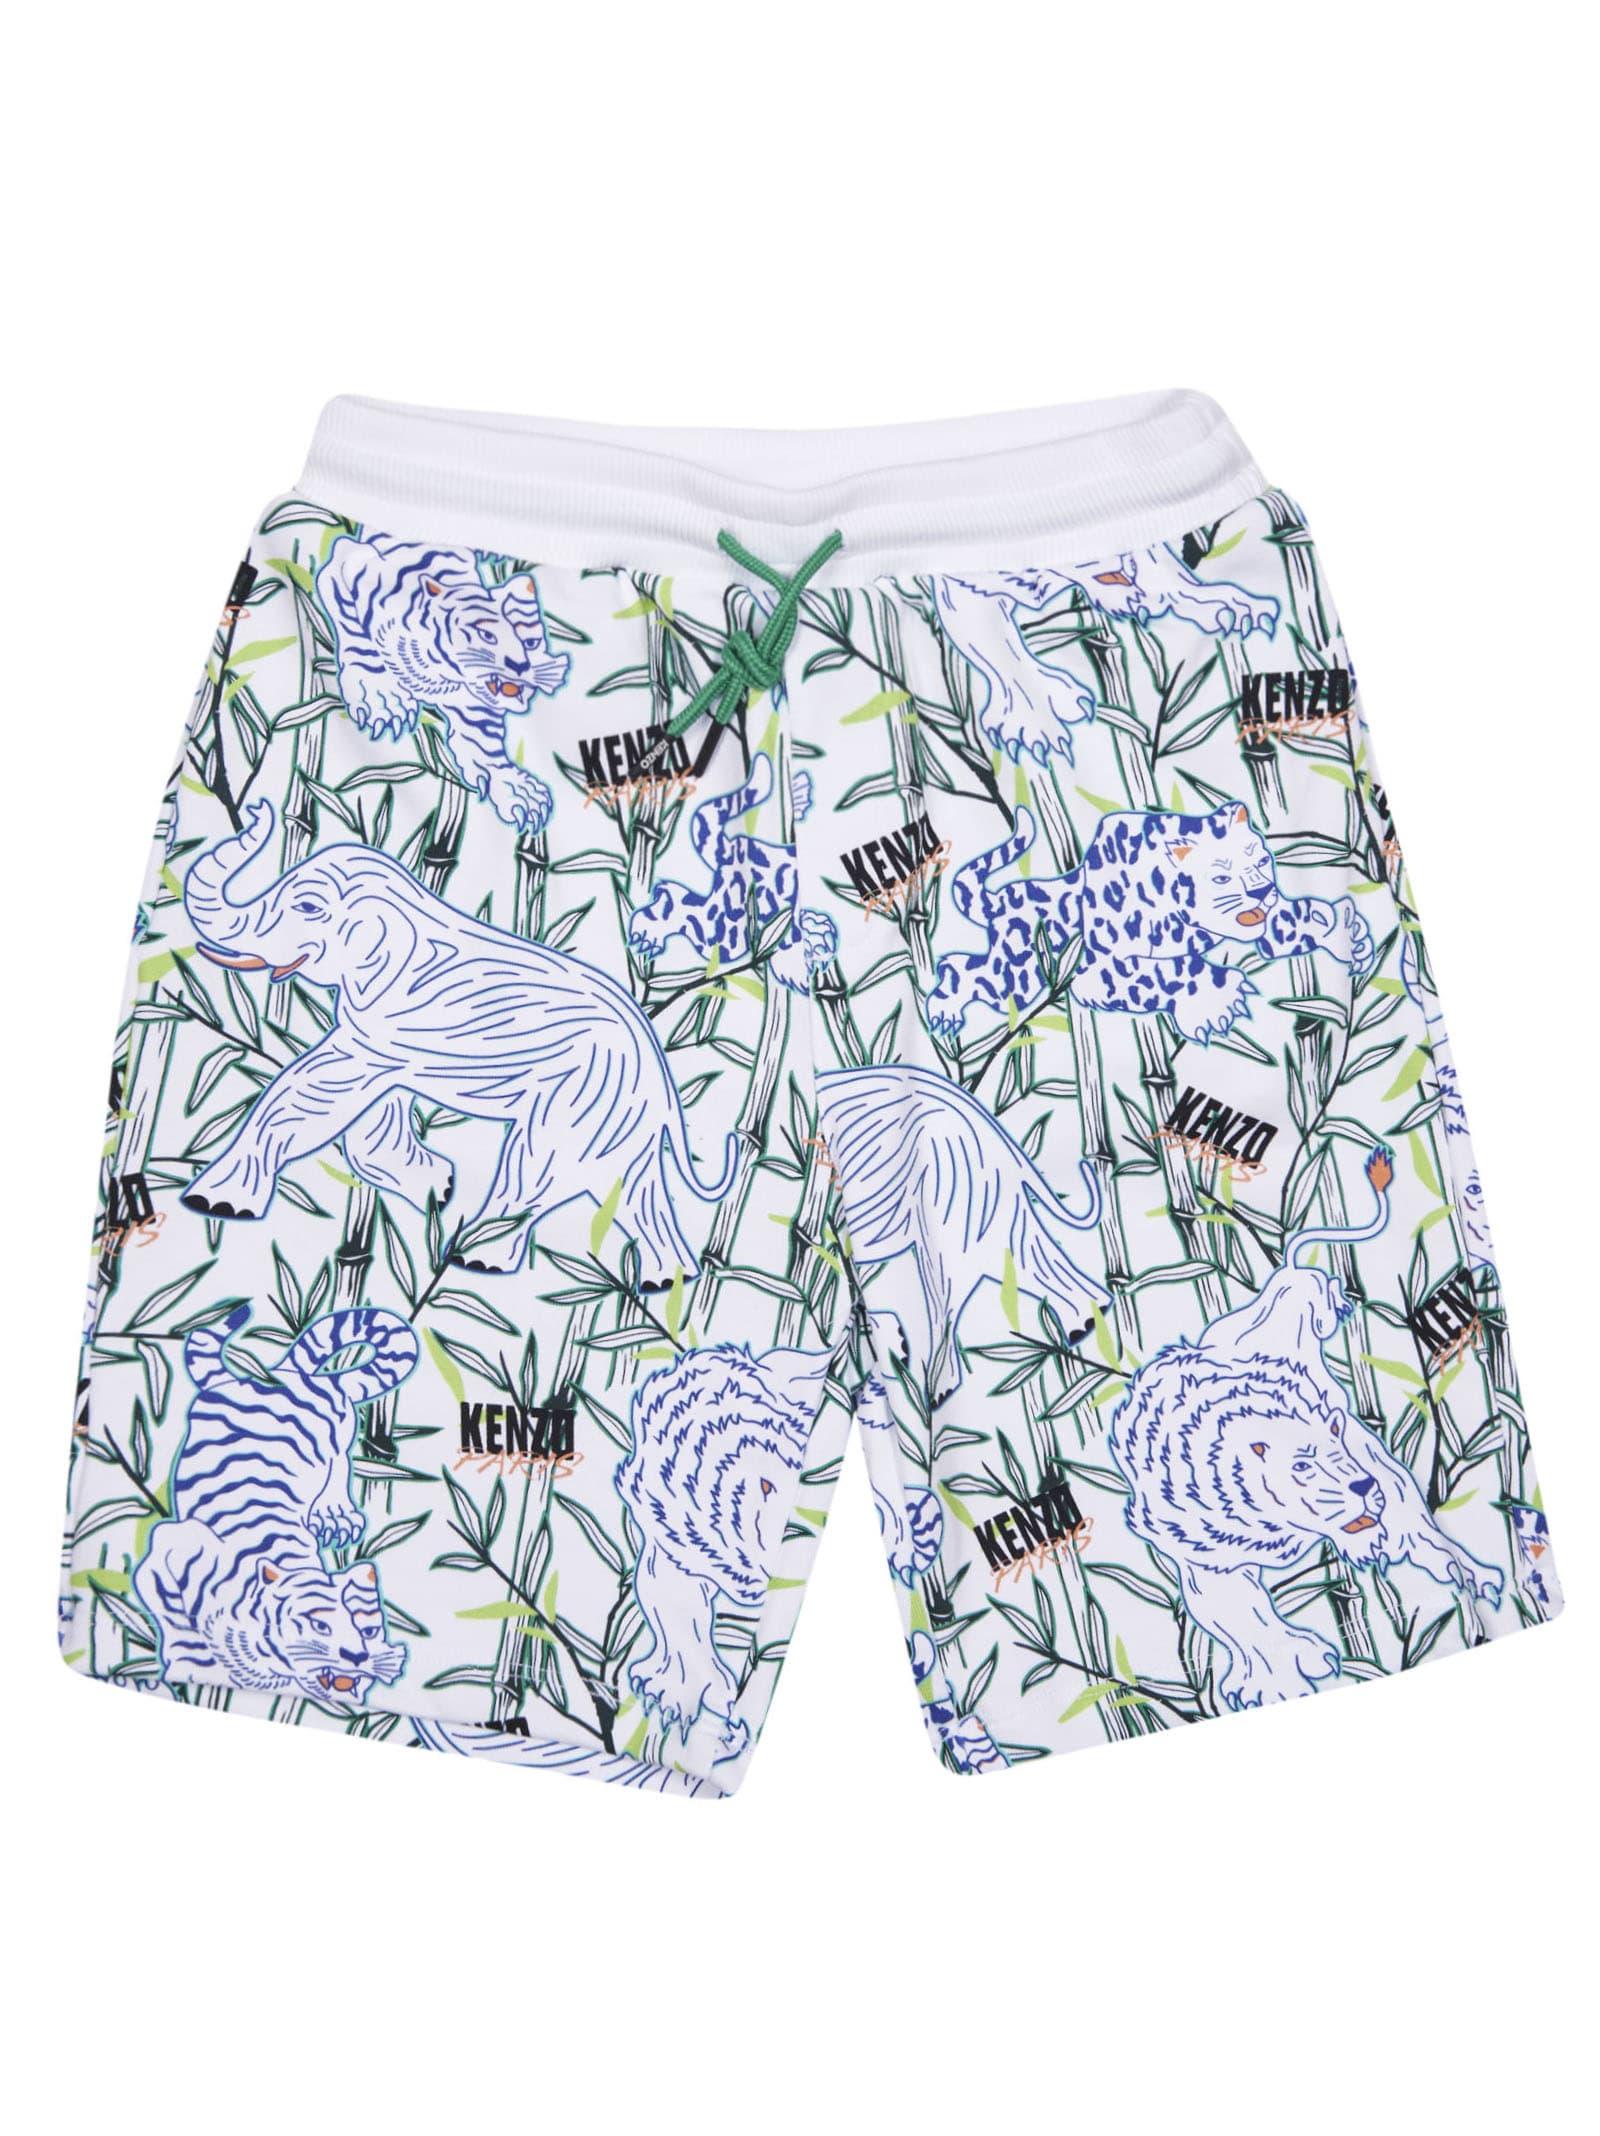 Elephant & Tiger Print Shorts